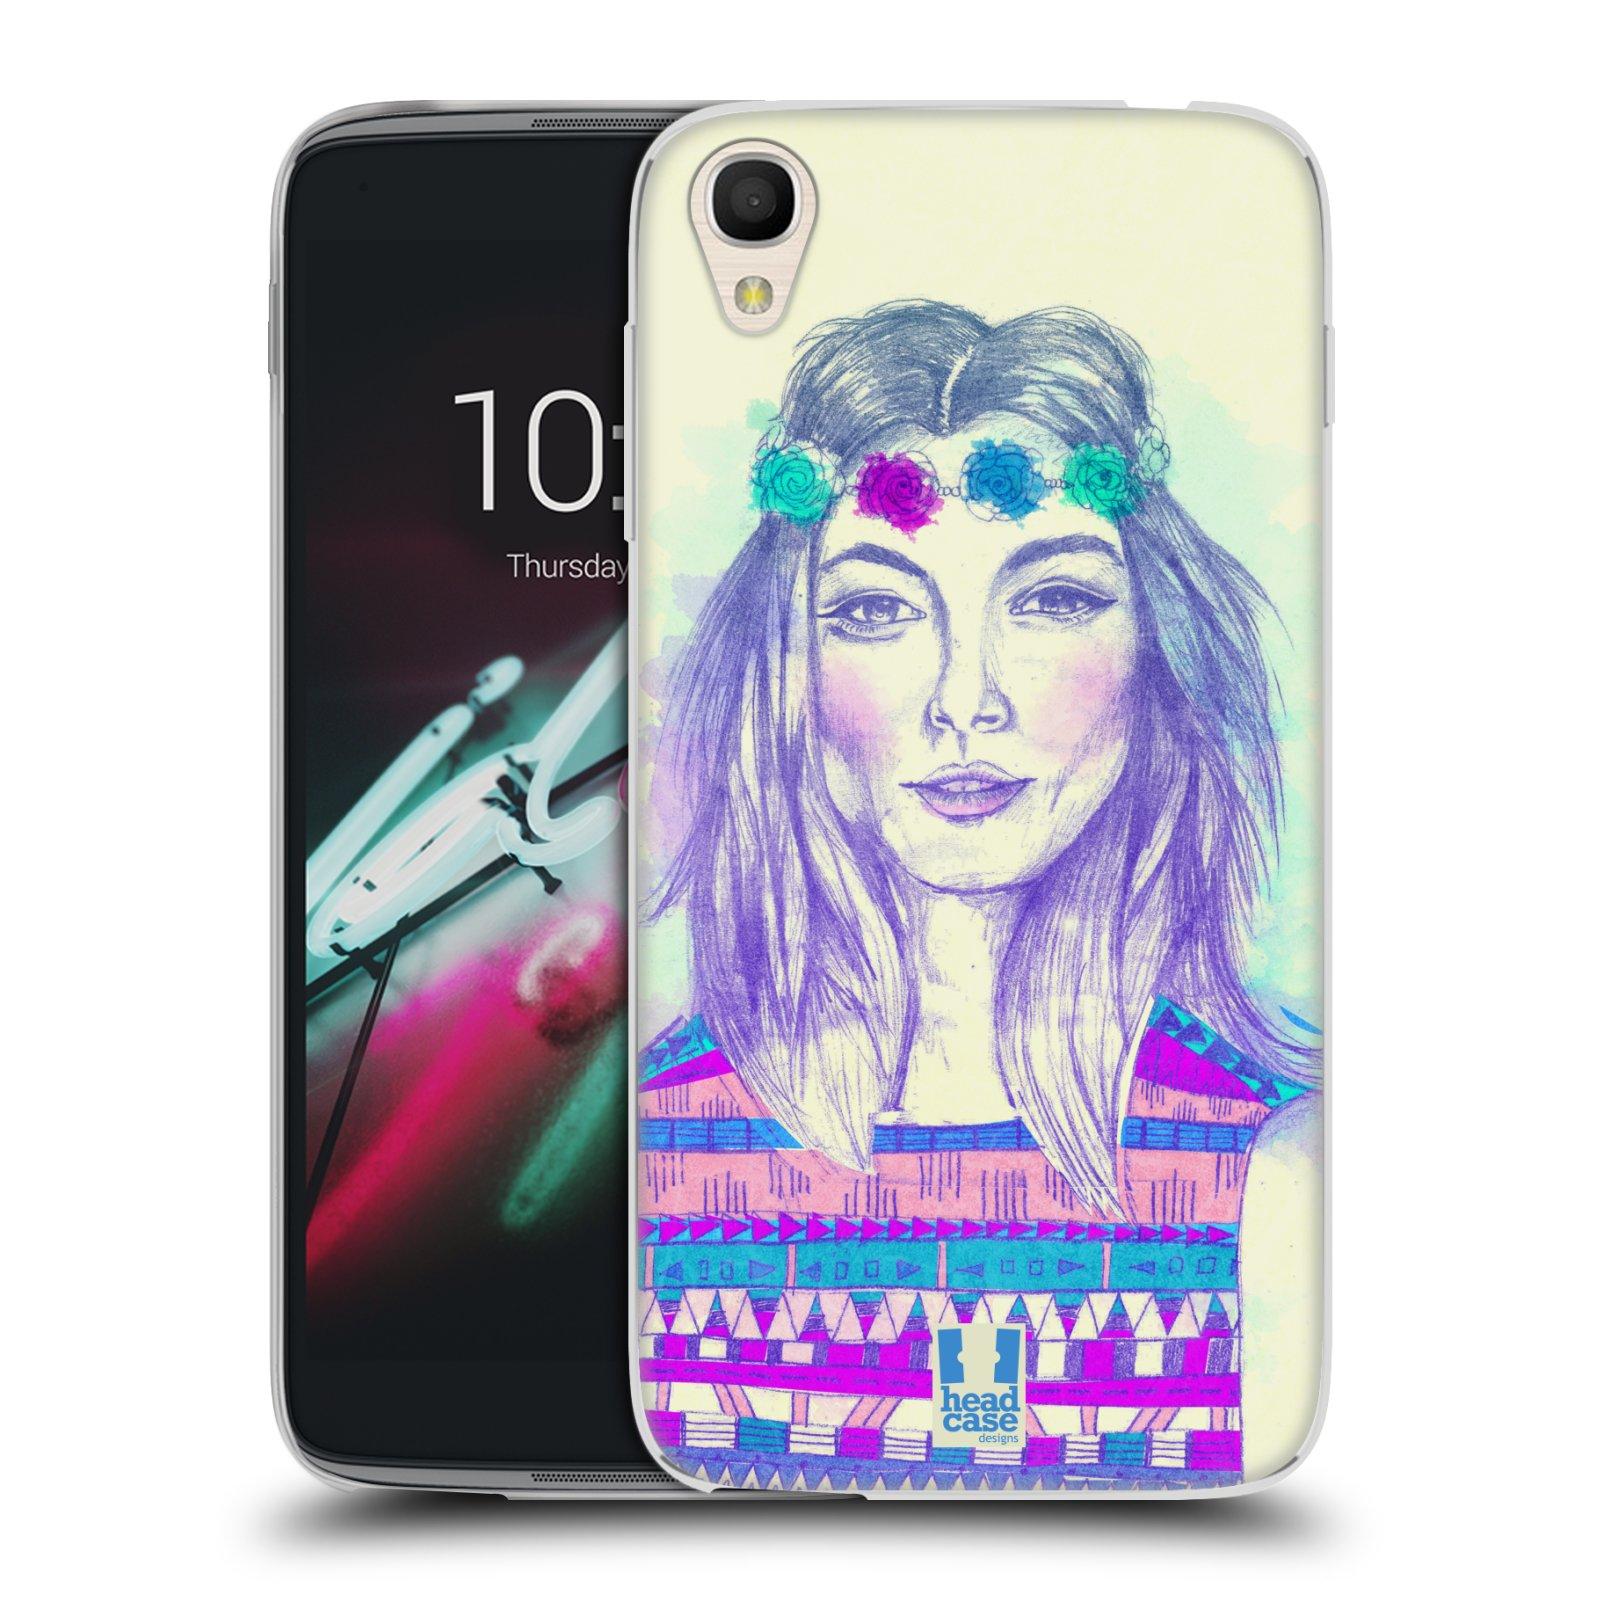 HEAD CASE silikonový obal na mobil Alcatel Idol 3 OT-6039Y (4.7) vzor Dívka dlouhé květinové vlasy HIPPIE modrá